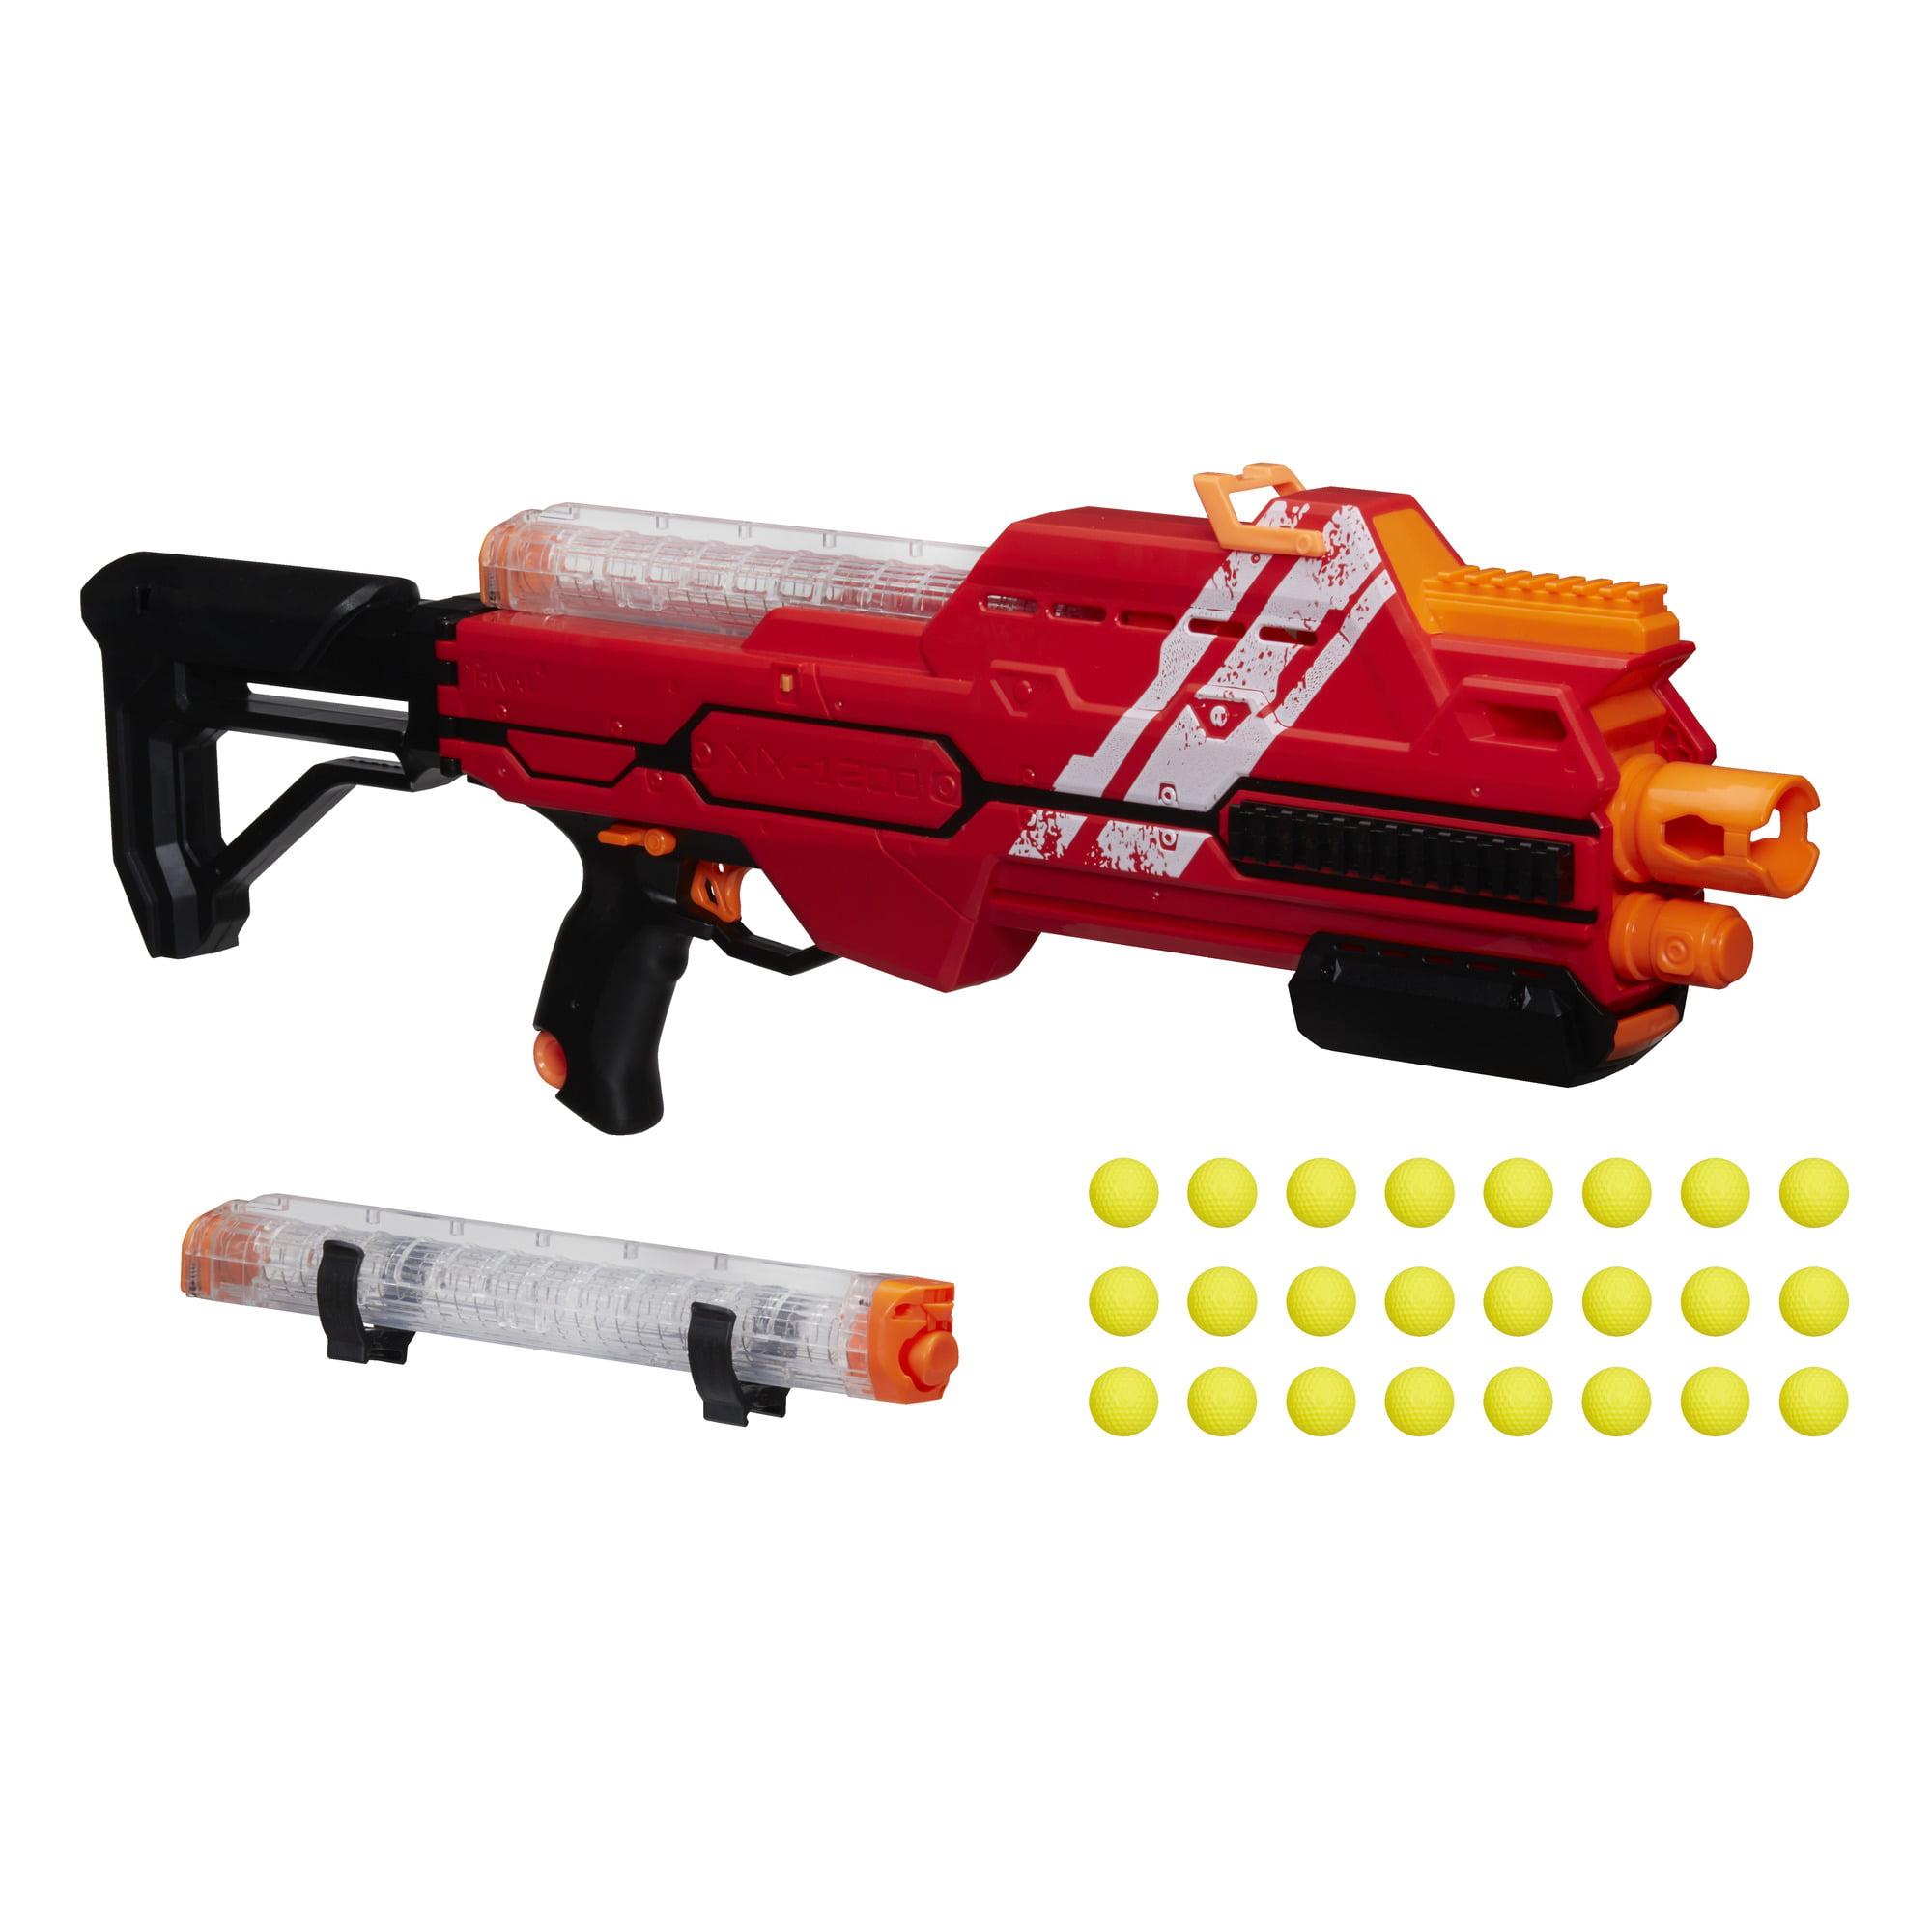 Nerf Rival Hypnos XIX-1200 Blaster (red)